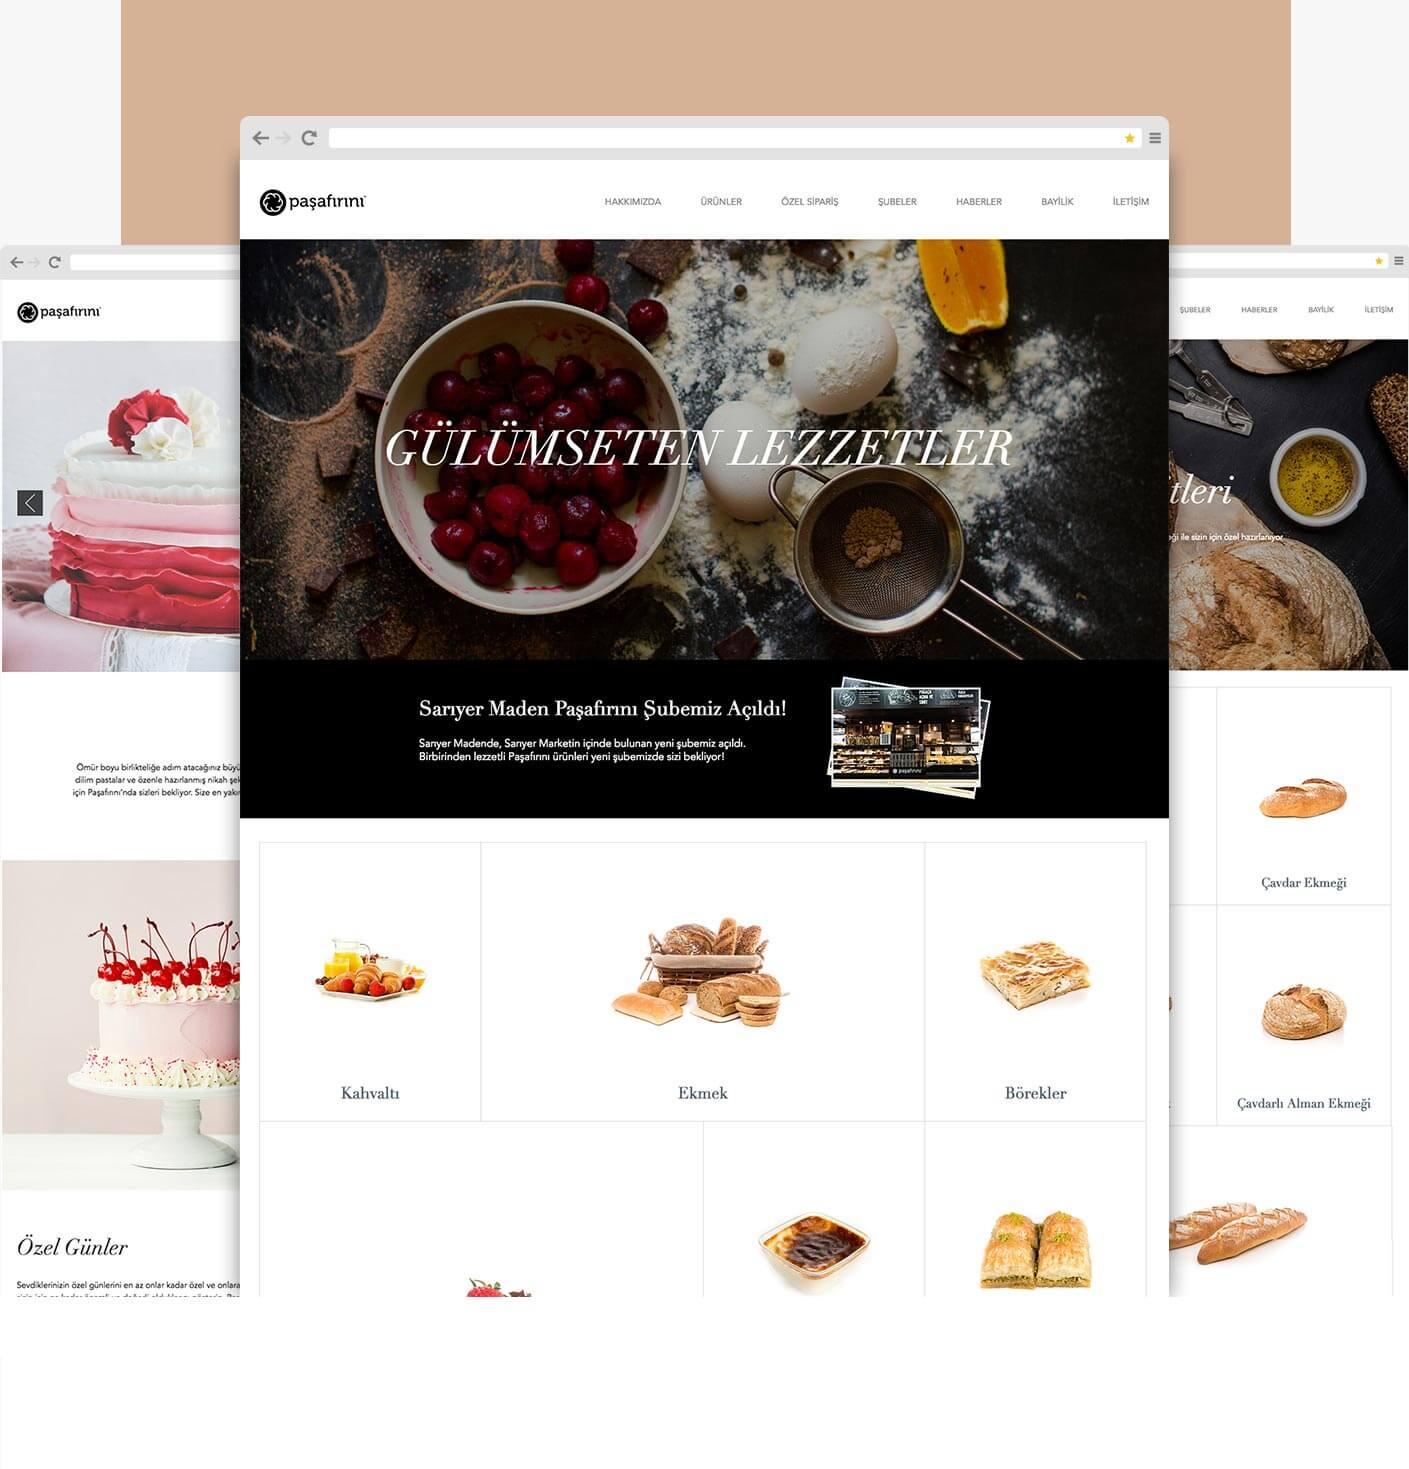 Pasafirini web design, user experience design, UI, UX